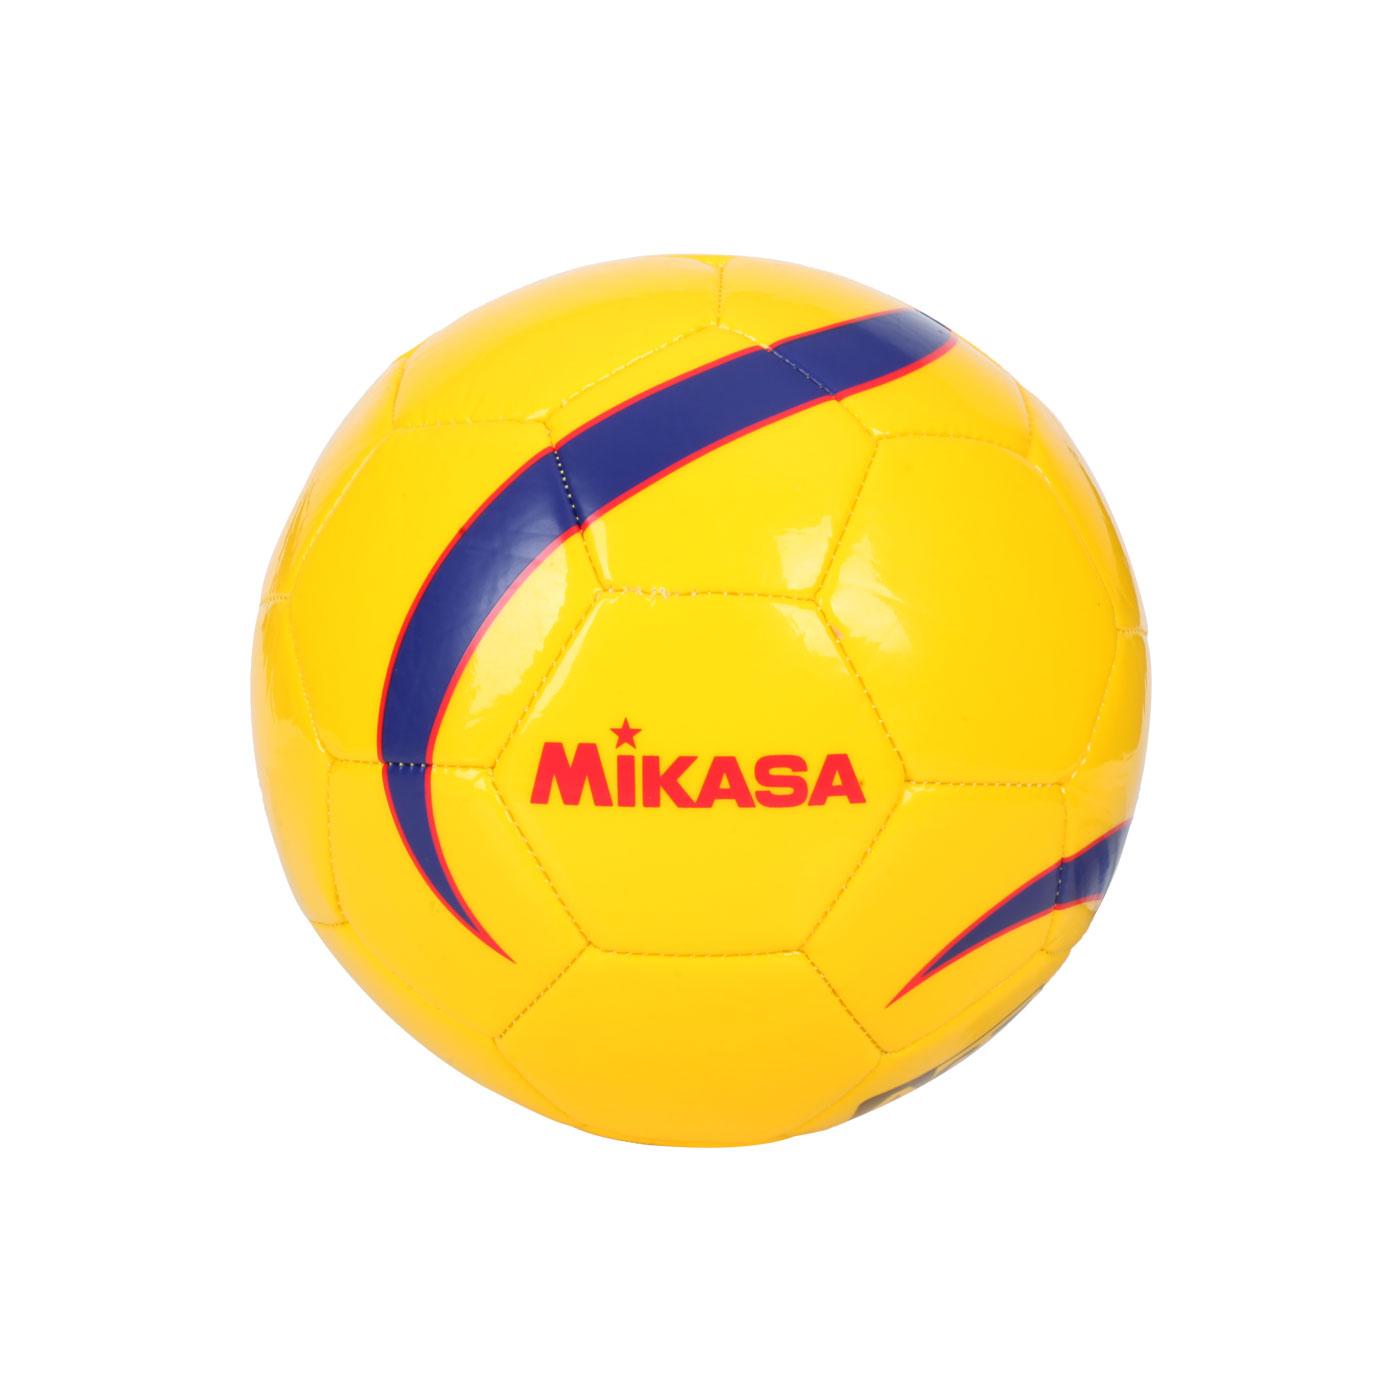 MIKASA 合成皮手縫5人制足球 FSC62Y - 黃紅藍